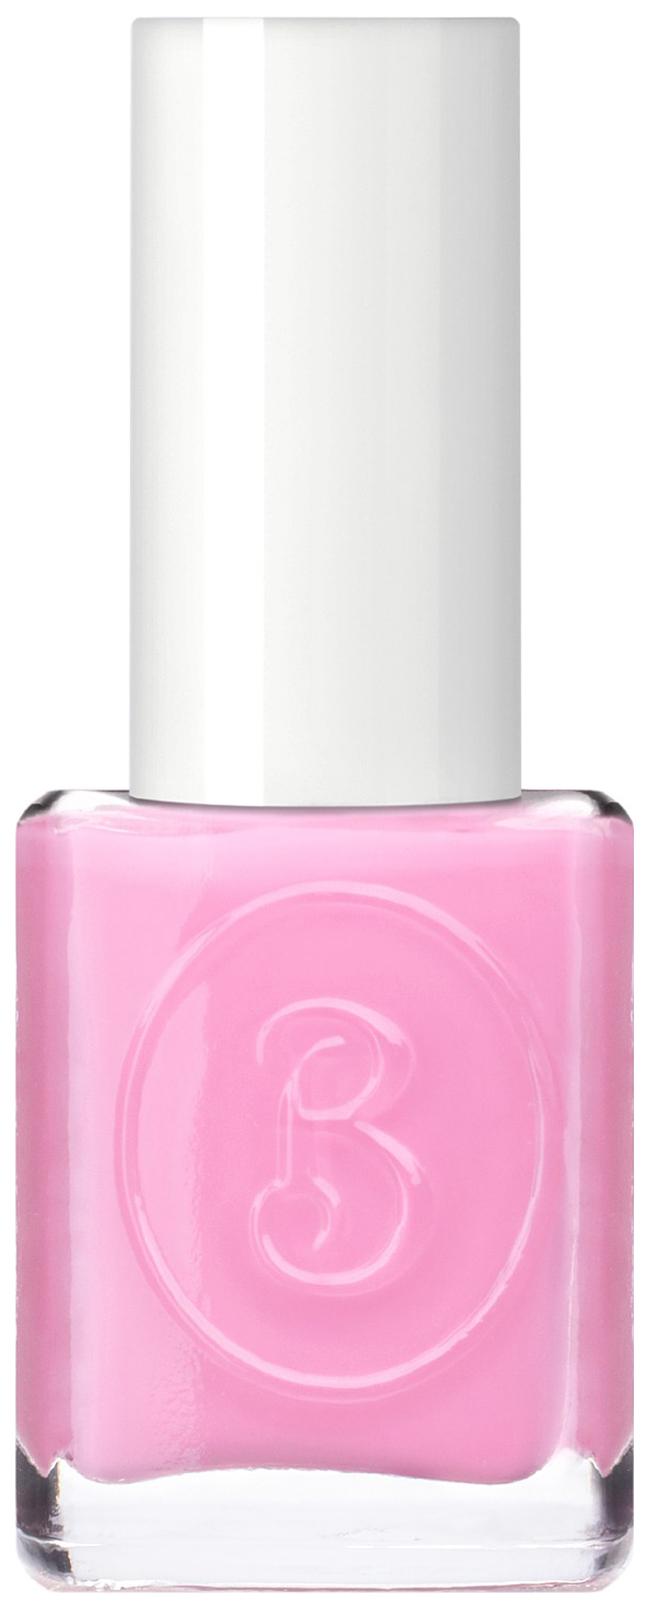 Лак для ногтей Berenice Oxygen Nail Lacquer 50 Baby Pink 15 мл по цене 415